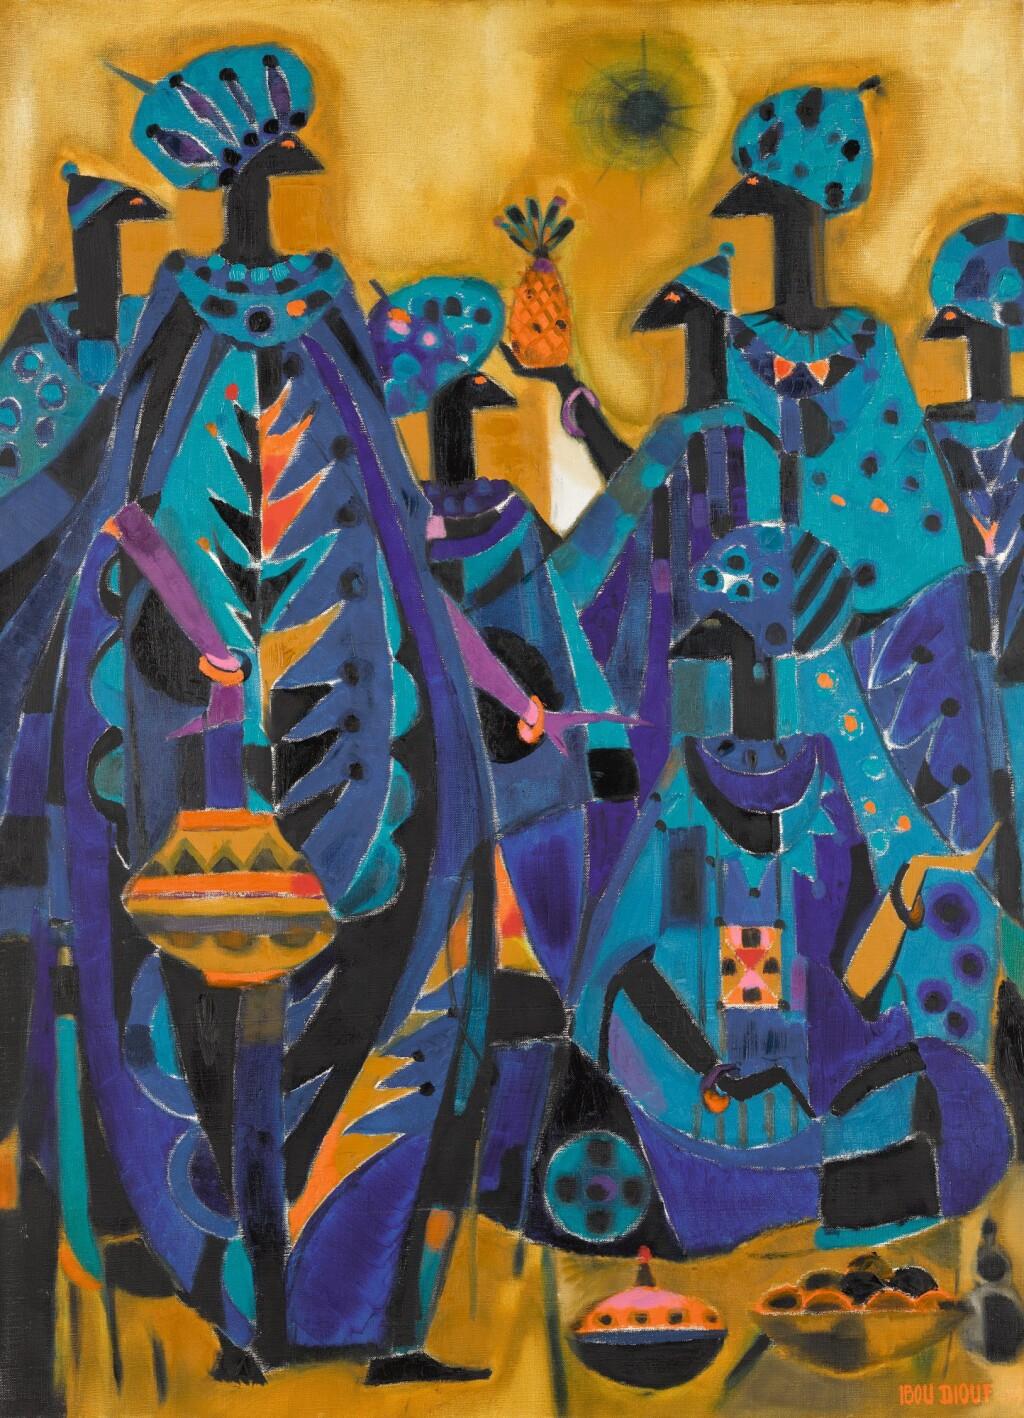 IBOU DIOUF | LE ROYAUME BLEU D'ENFANCE